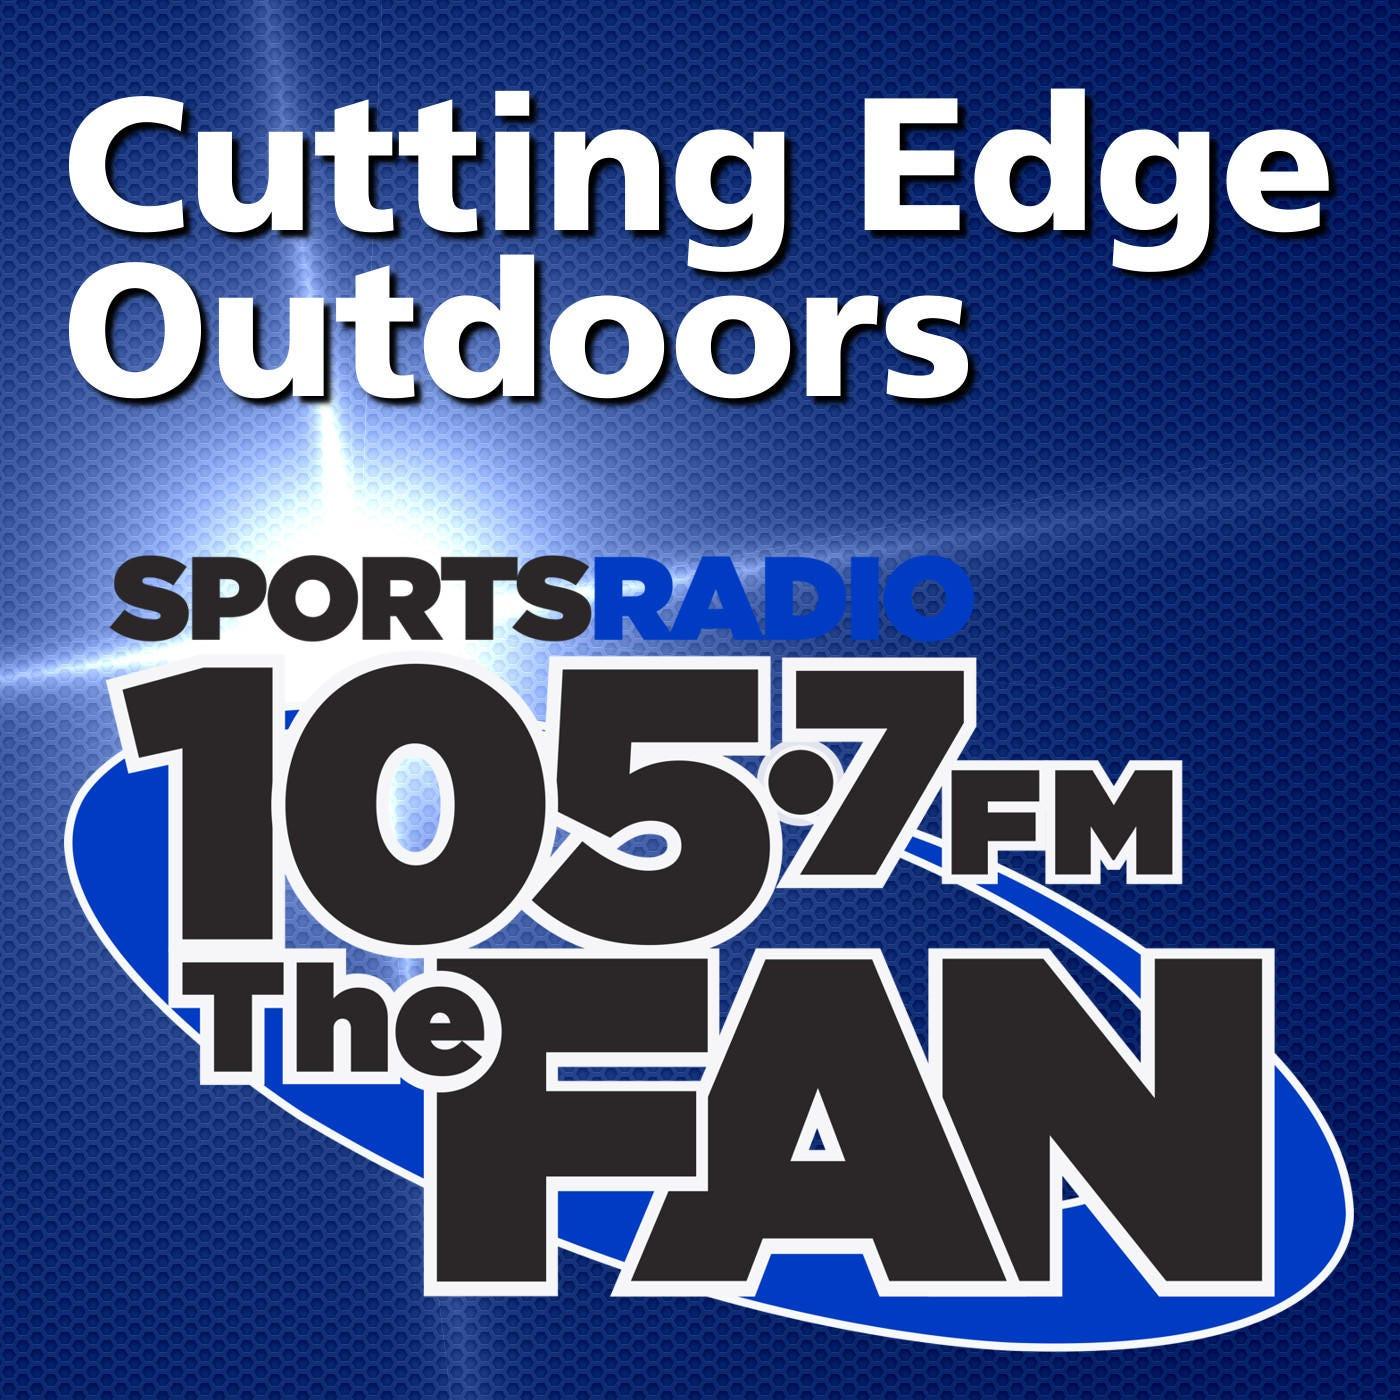 Cutting Edge Outdoors